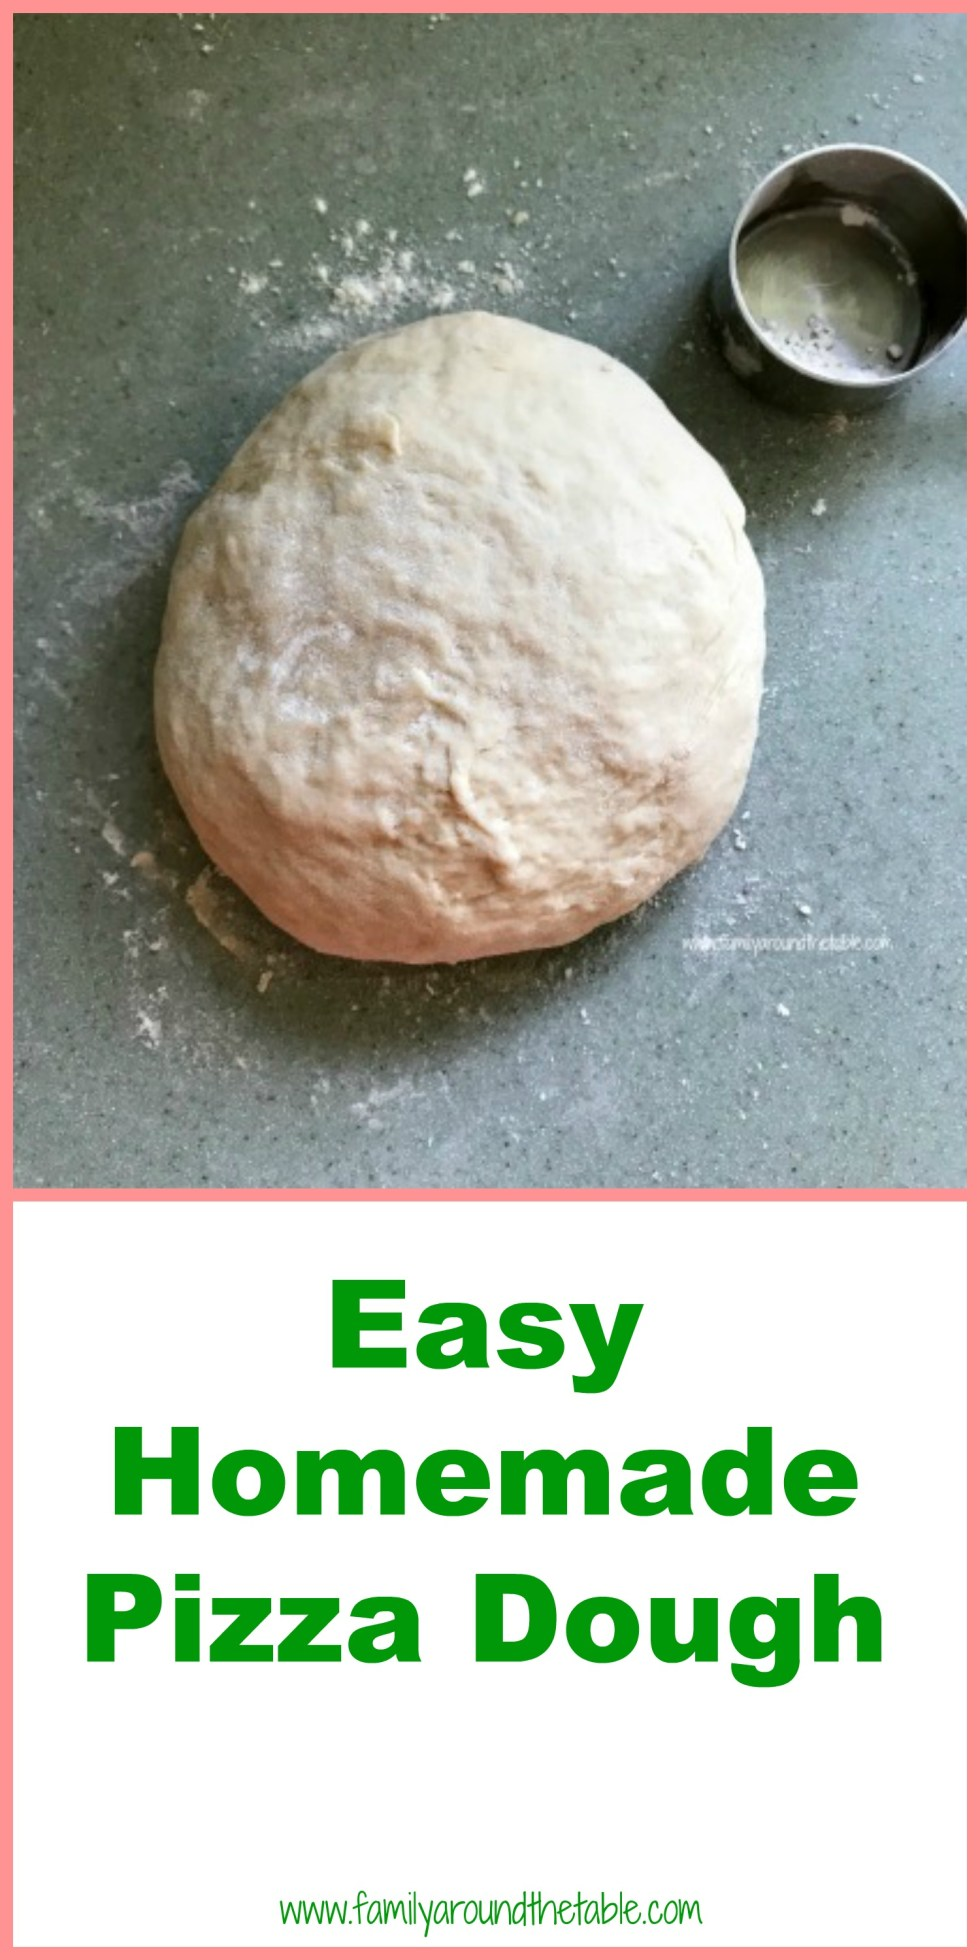 Homemade pizza dough Pinterest image.